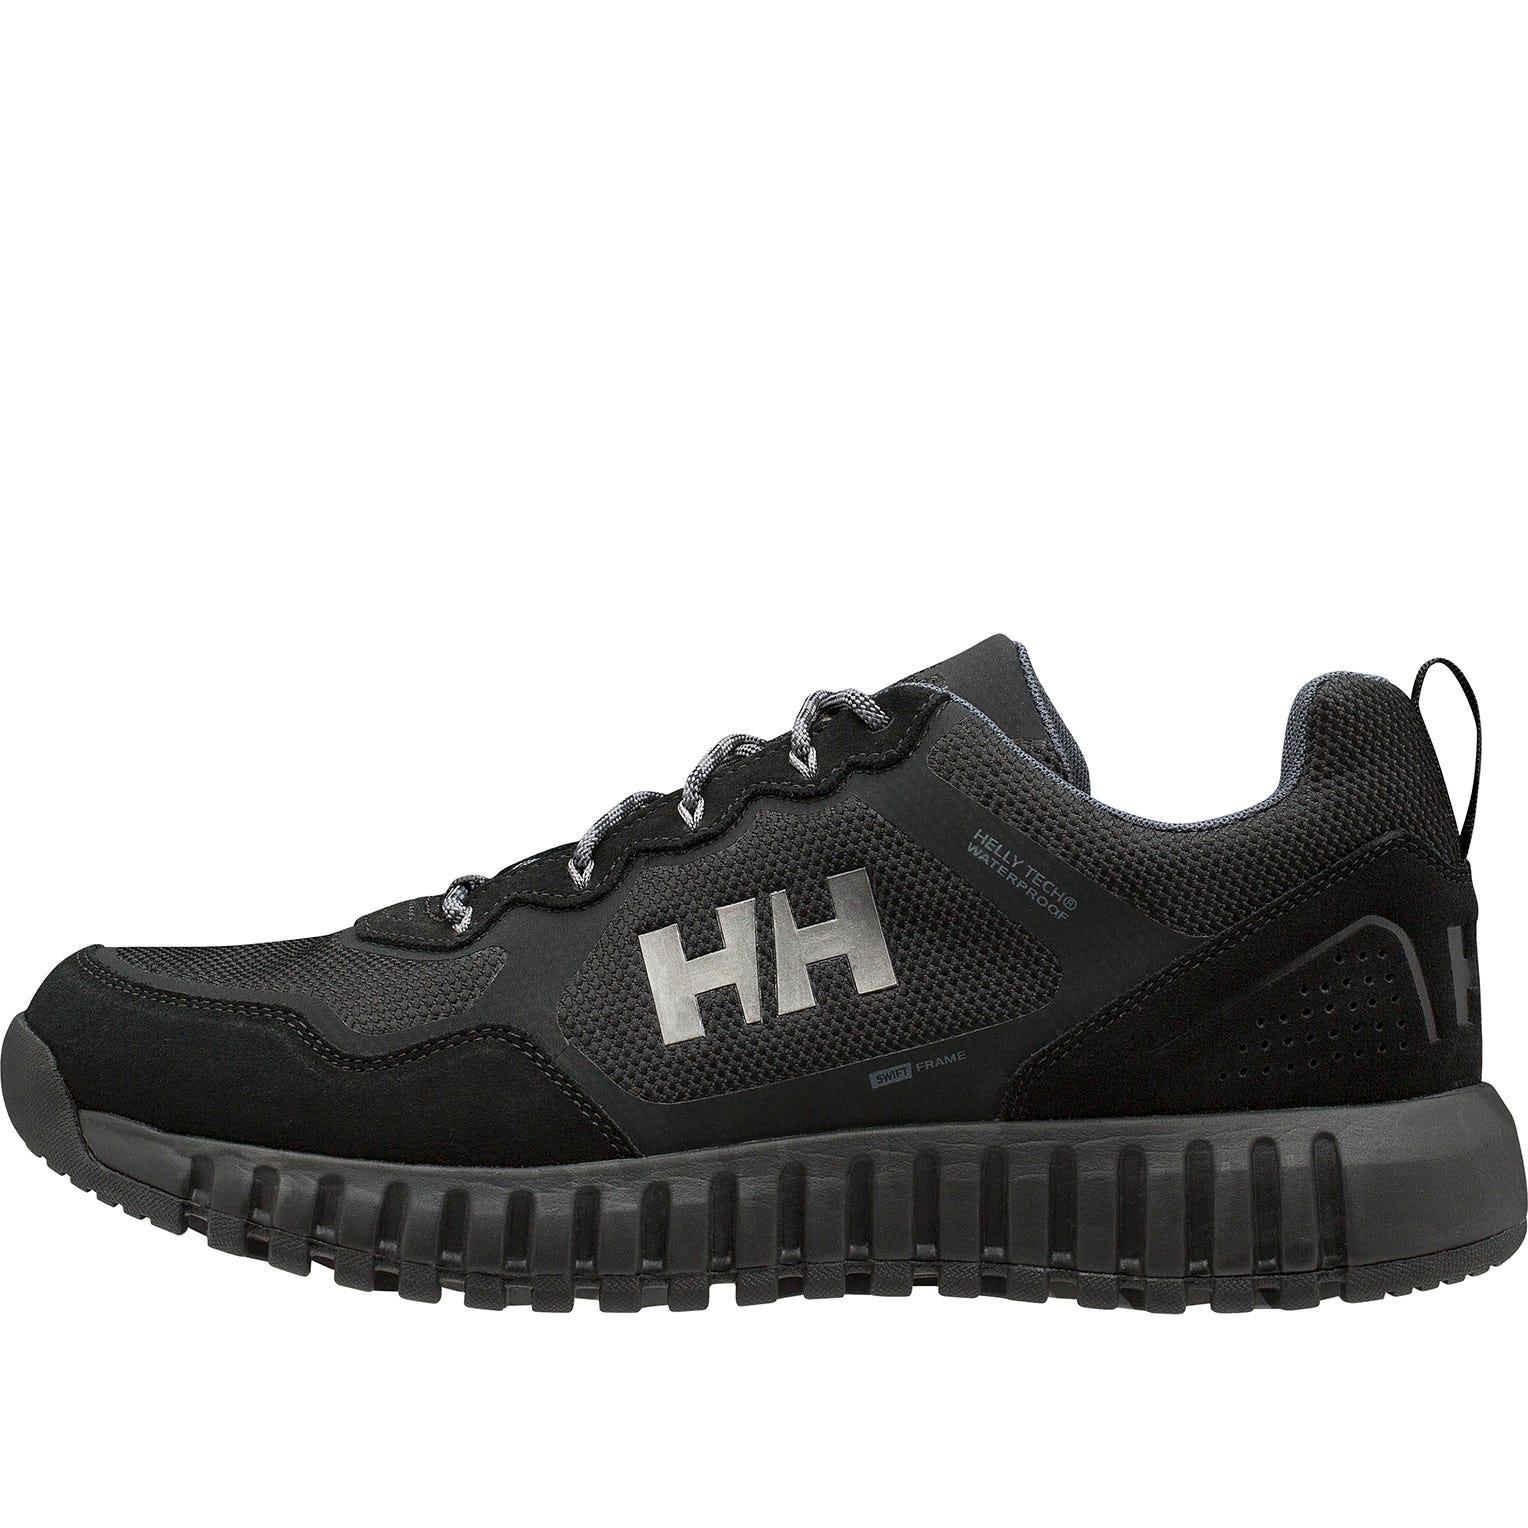 Helly Hansen Monashee Ullr Low Ht Mens Hiking Boot Black 40/7